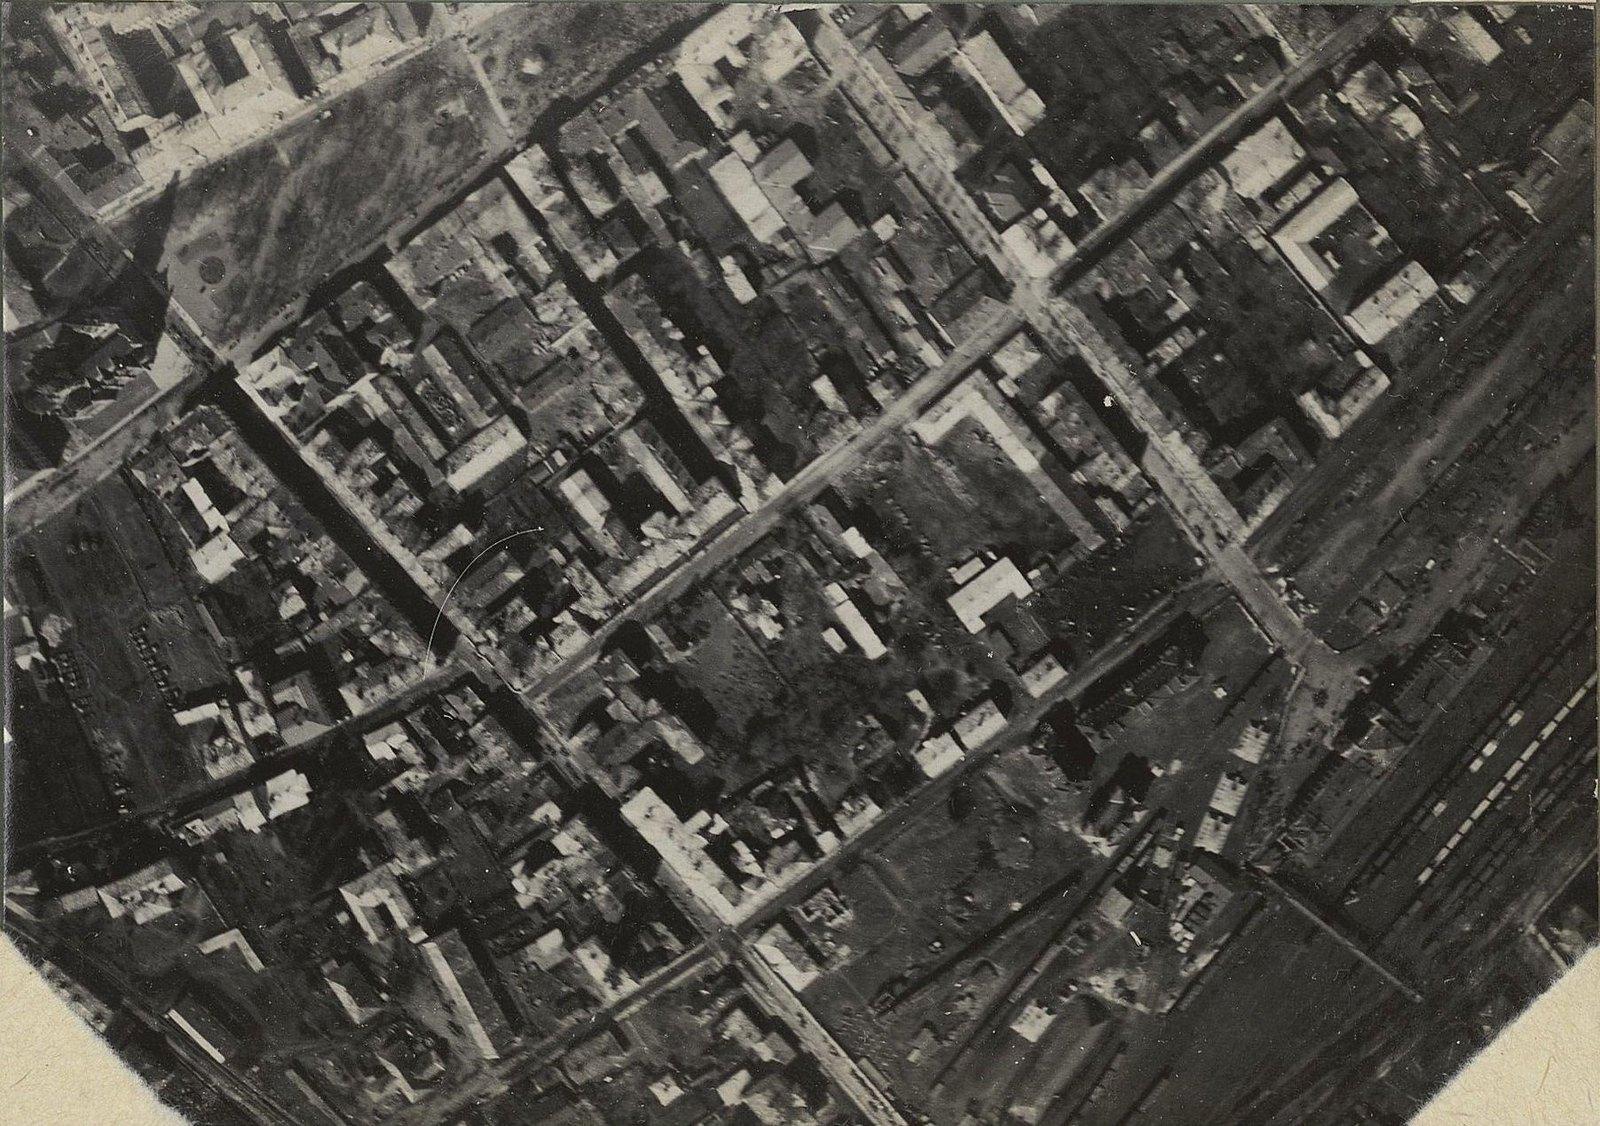 26. 1917. Тарнополь, снятый с аэроплана